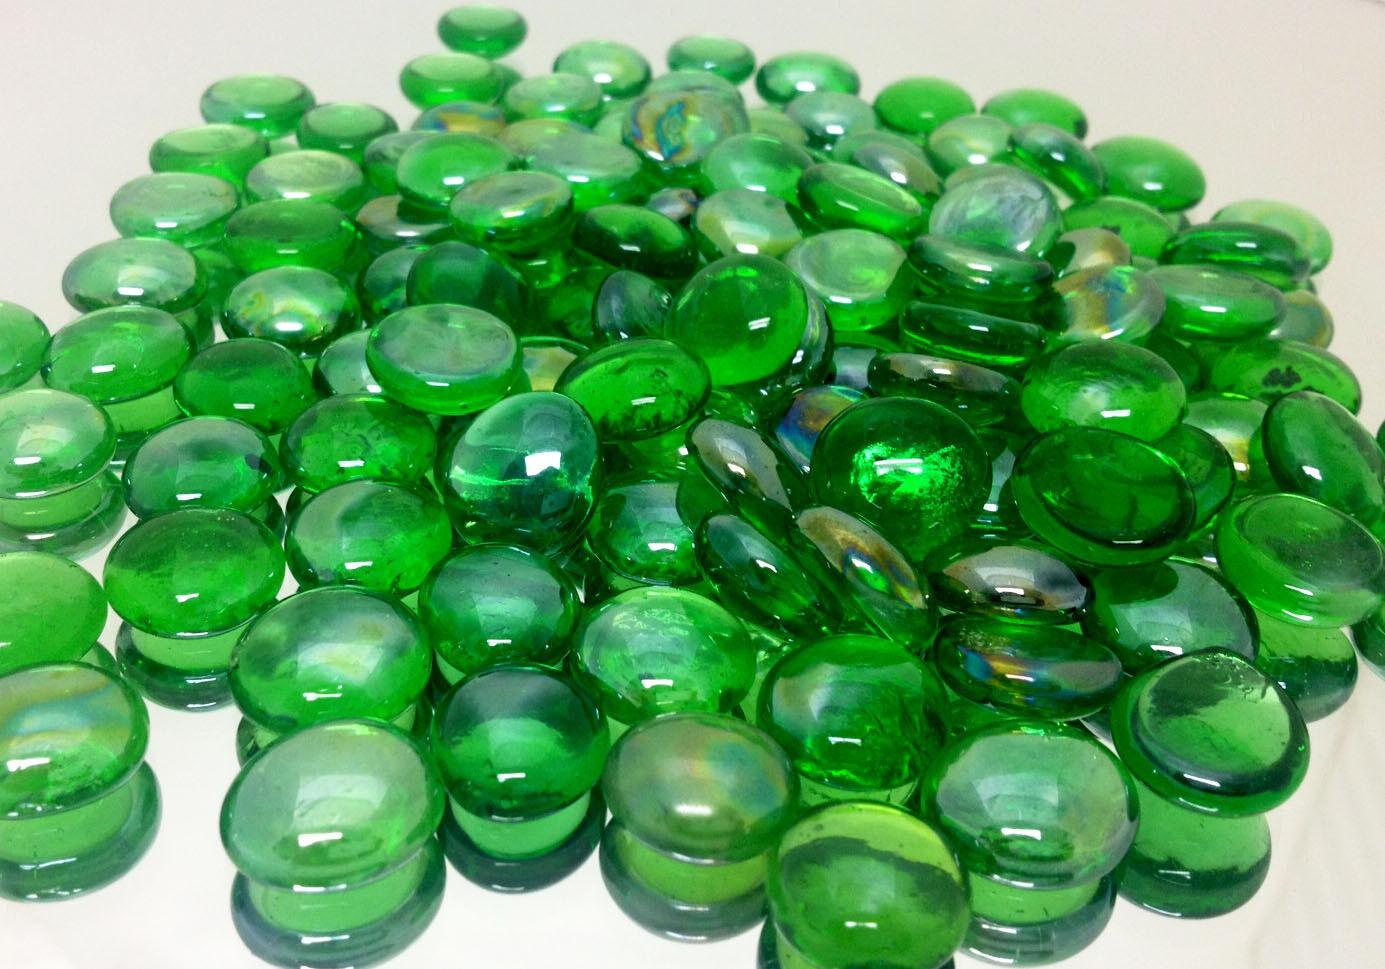 Mini 12mm glass gems marbles vase filler pebble stones home resntentobalflowflowcomponenttechnicalissues reviewsmspy